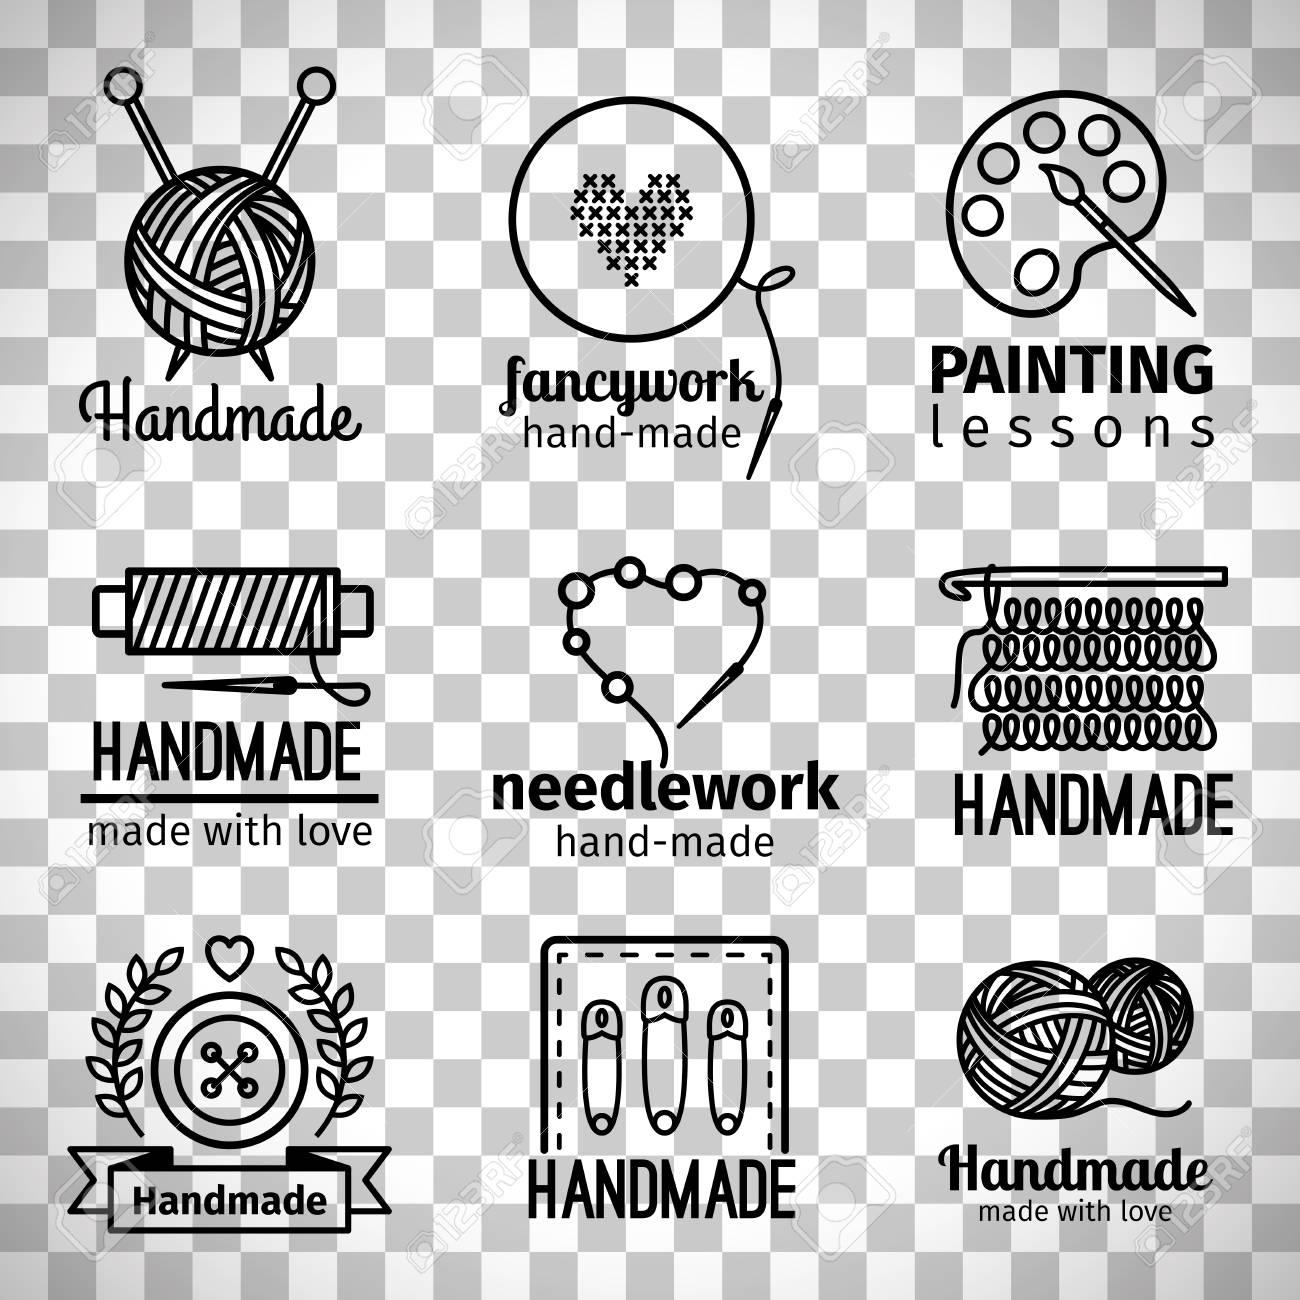 Handmade line icons, handmade workshop thin line logo set isolated on transparent background - 82893821